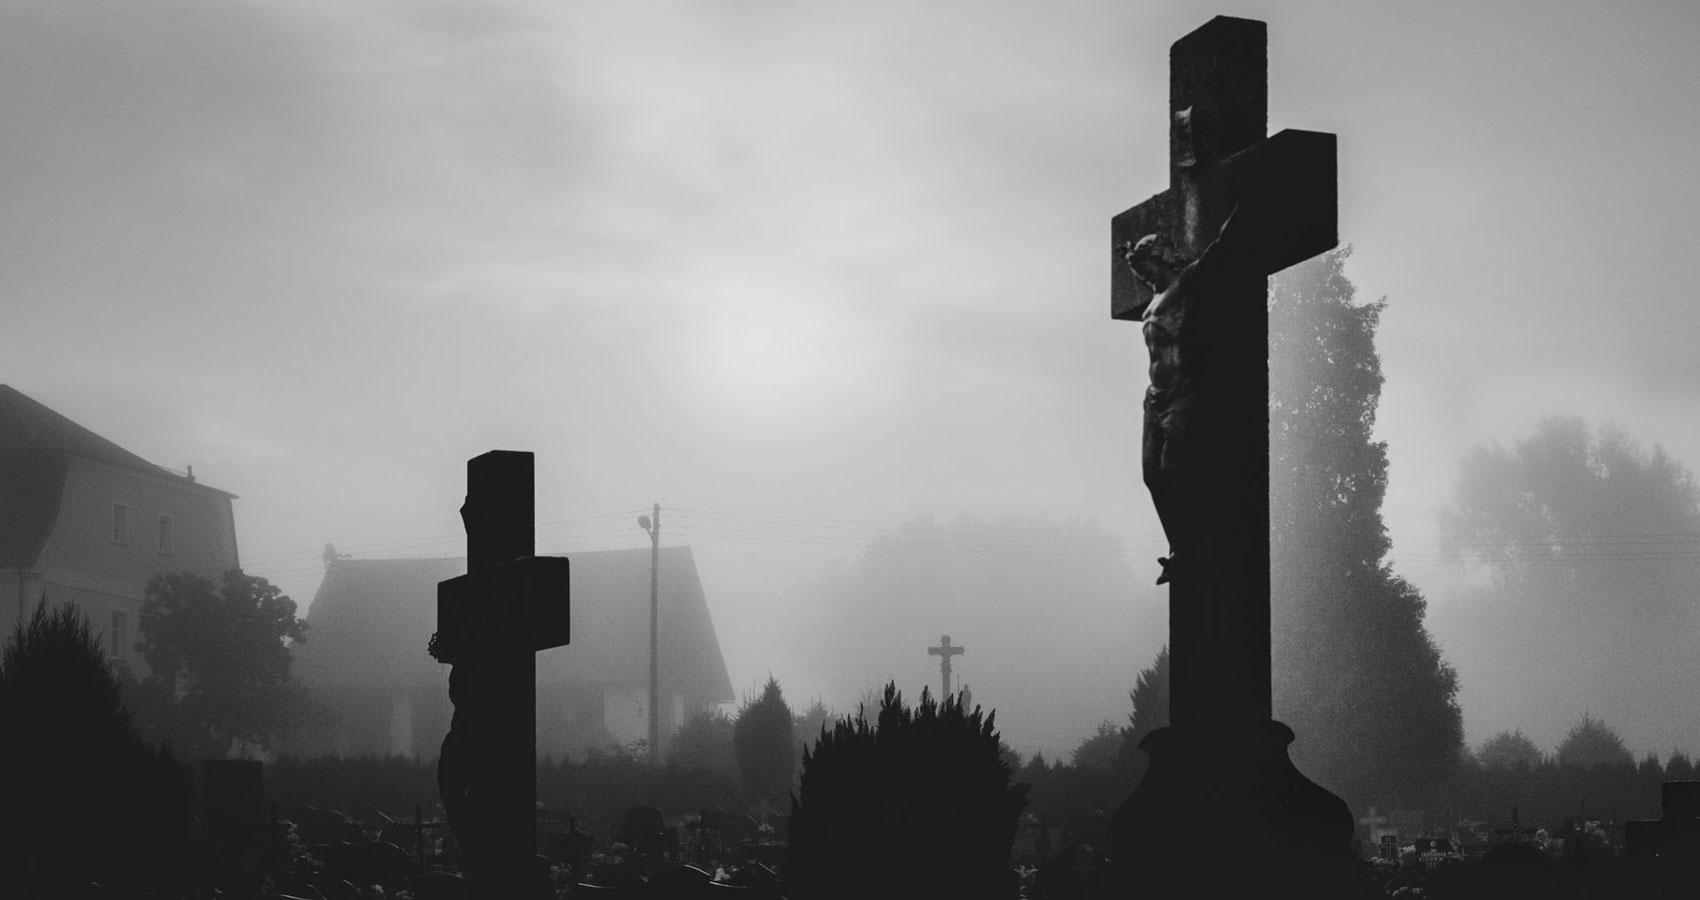 The Resurrectionist, a short story by Zach Ellenberger at Spillwords.com